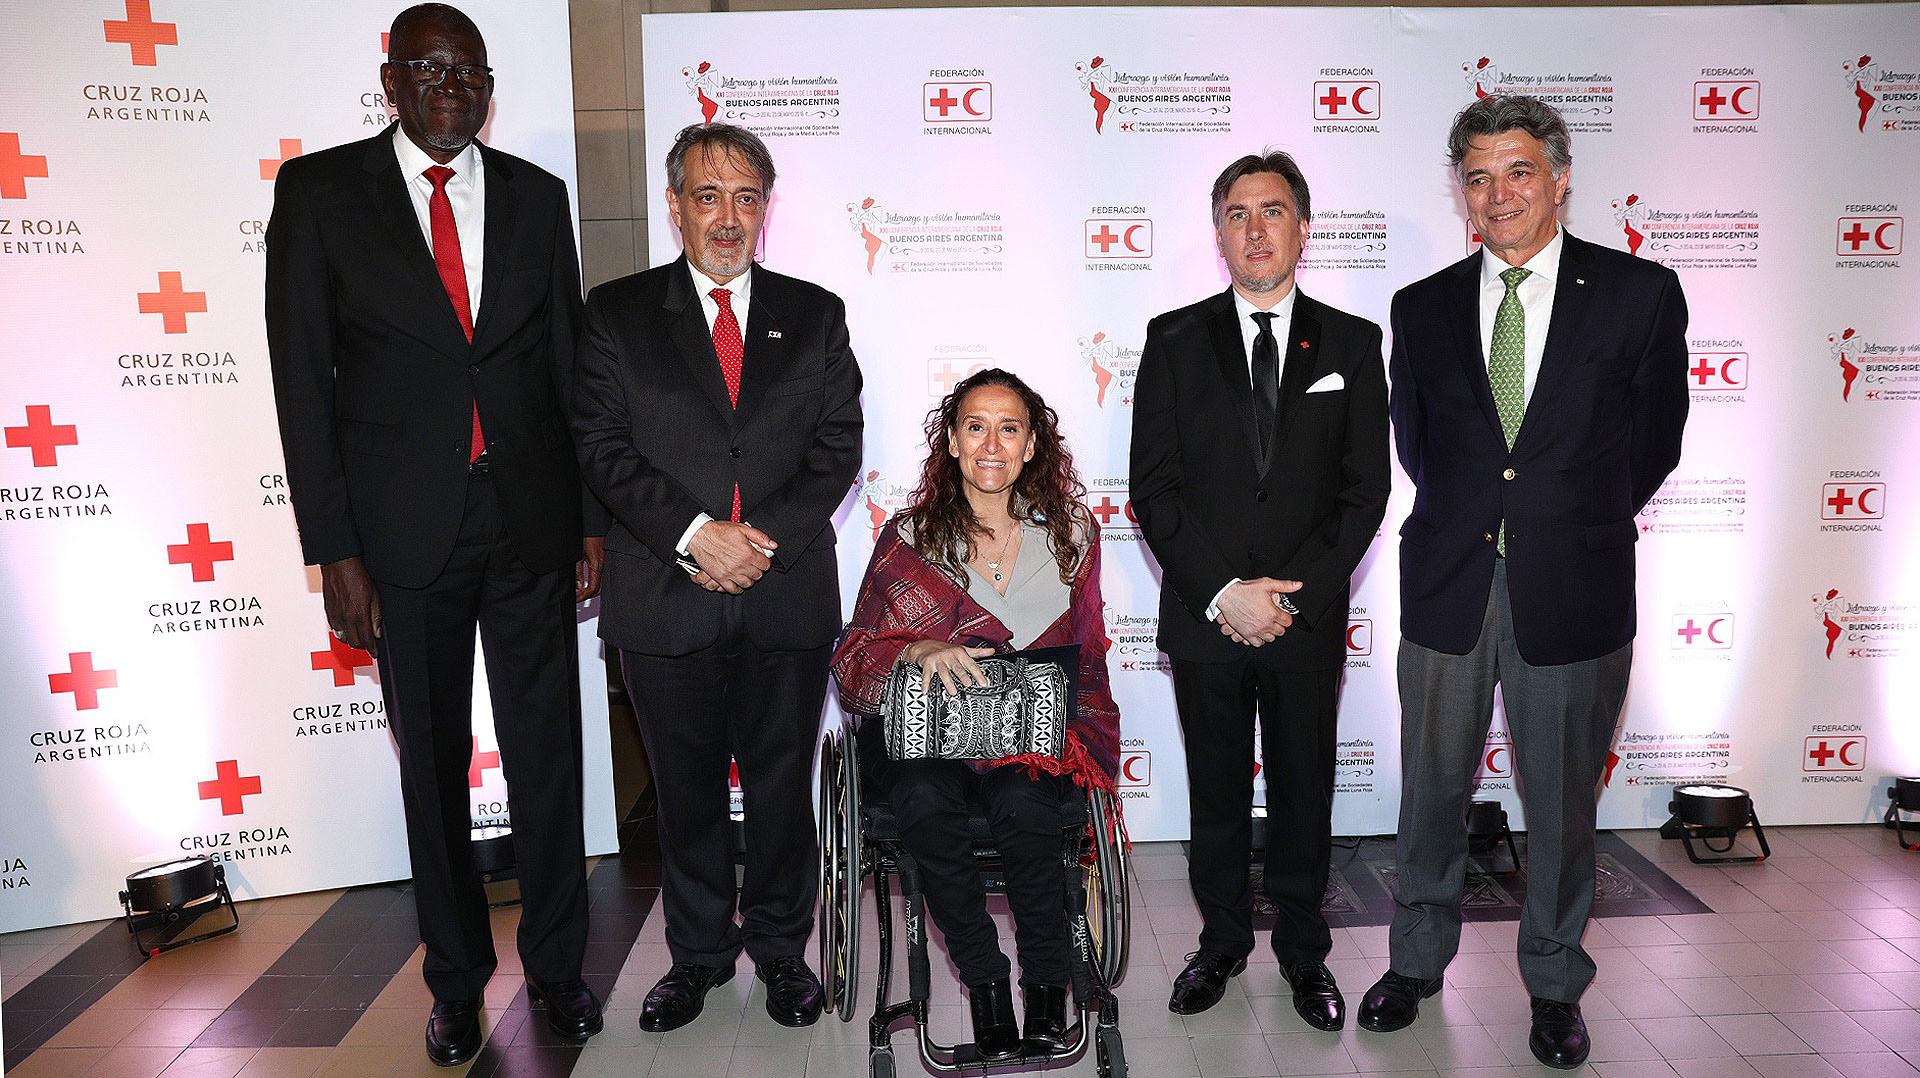 La vicepresidente Gabriela Michetti junto a los directivos de la Cruz Roja